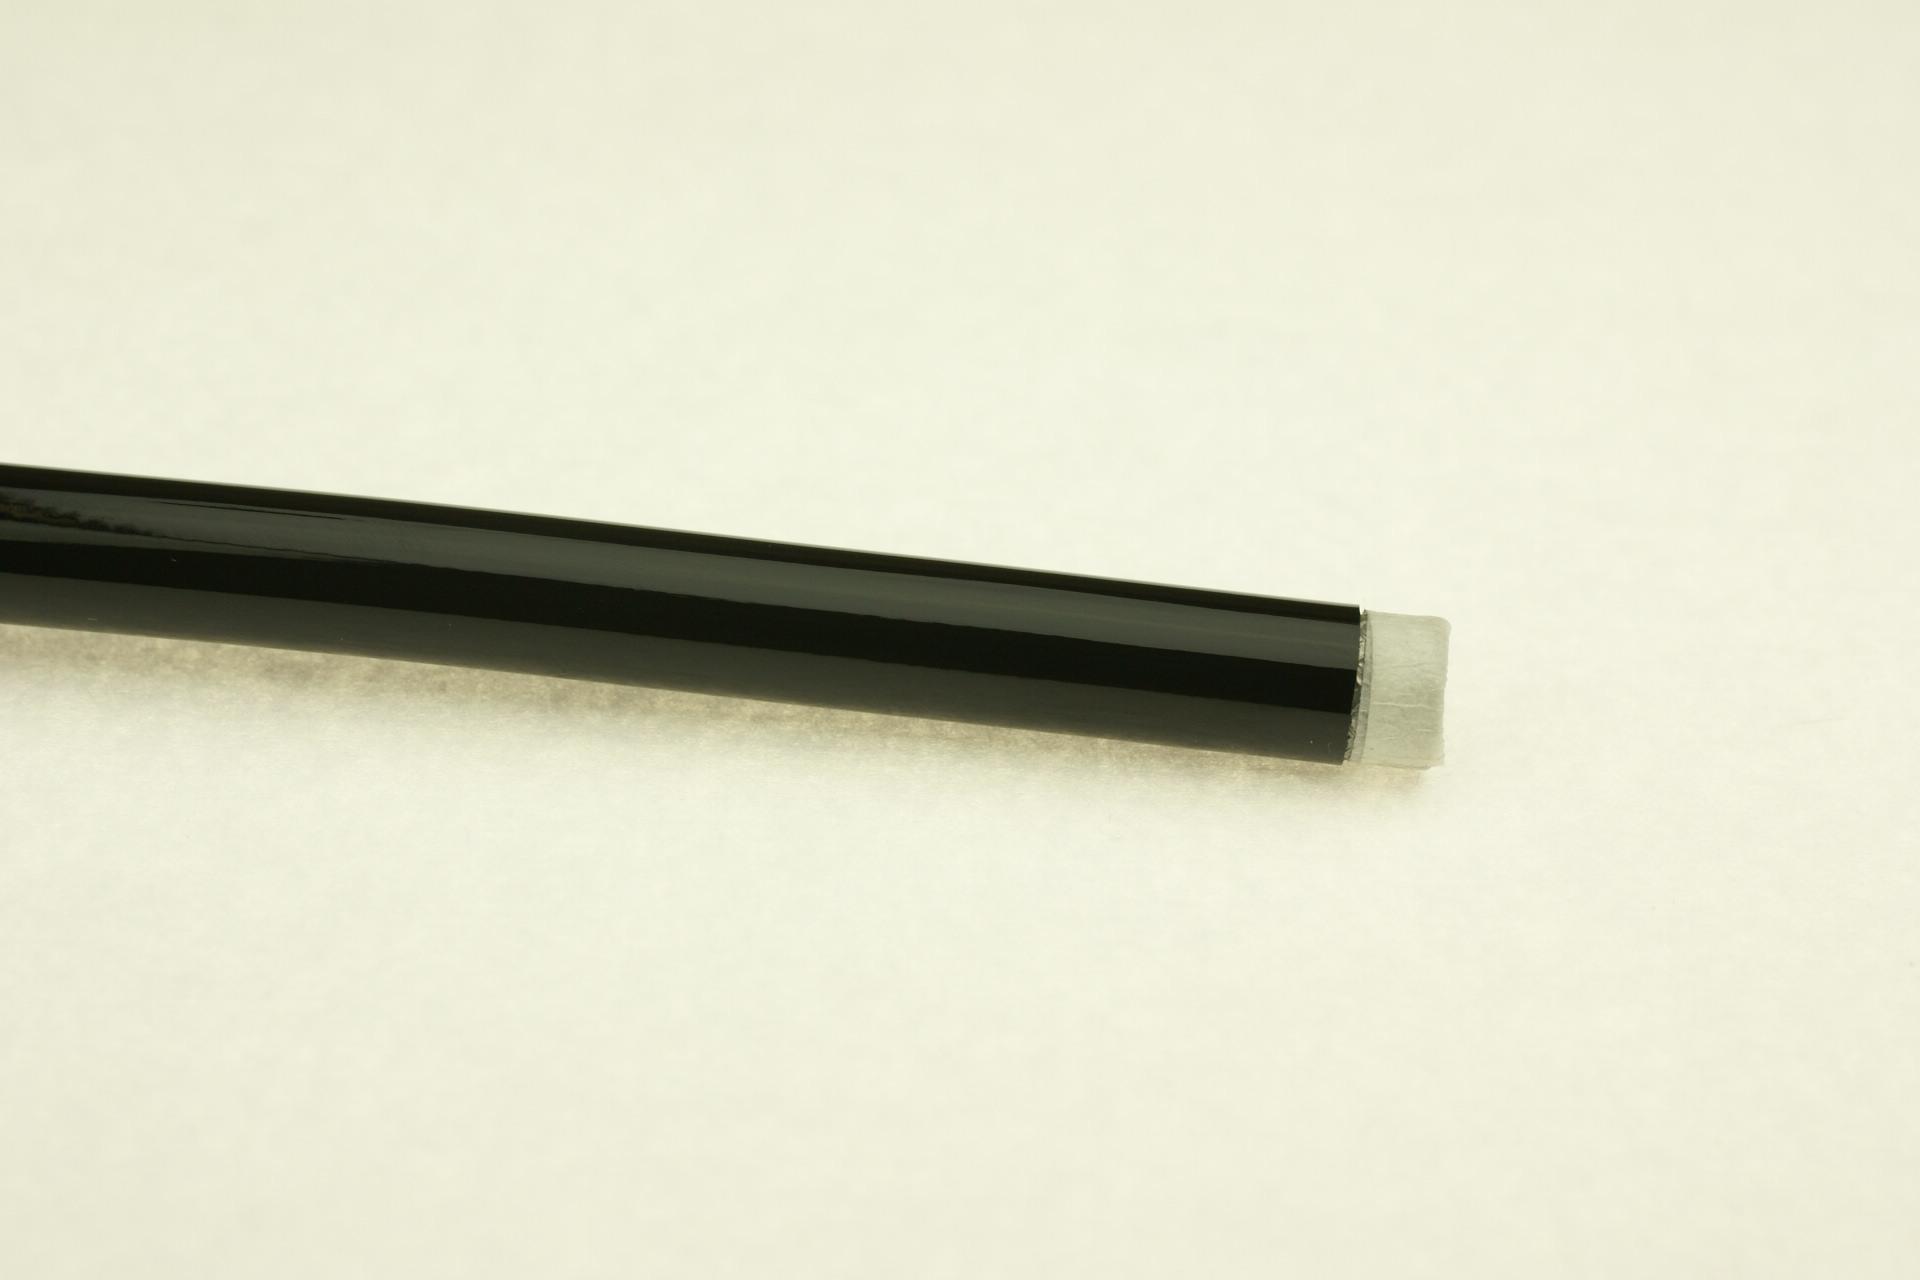 Light Guide Tube (Universal Cord) For Pentax® Bronchoscopes (7.9 X 1725mm)